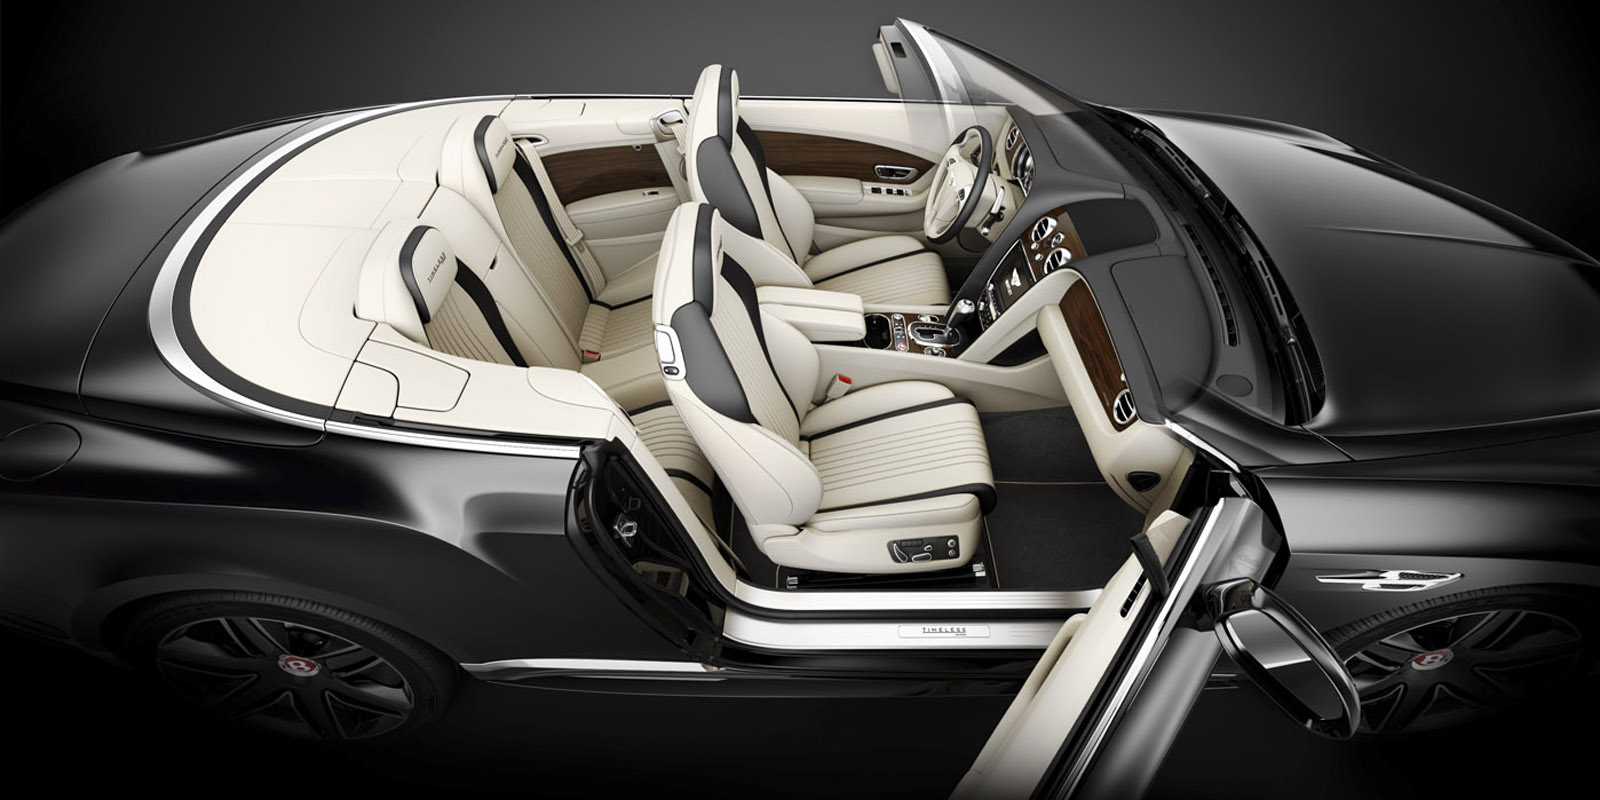 Bentley_Continental_GTC_Timeless_Series_07